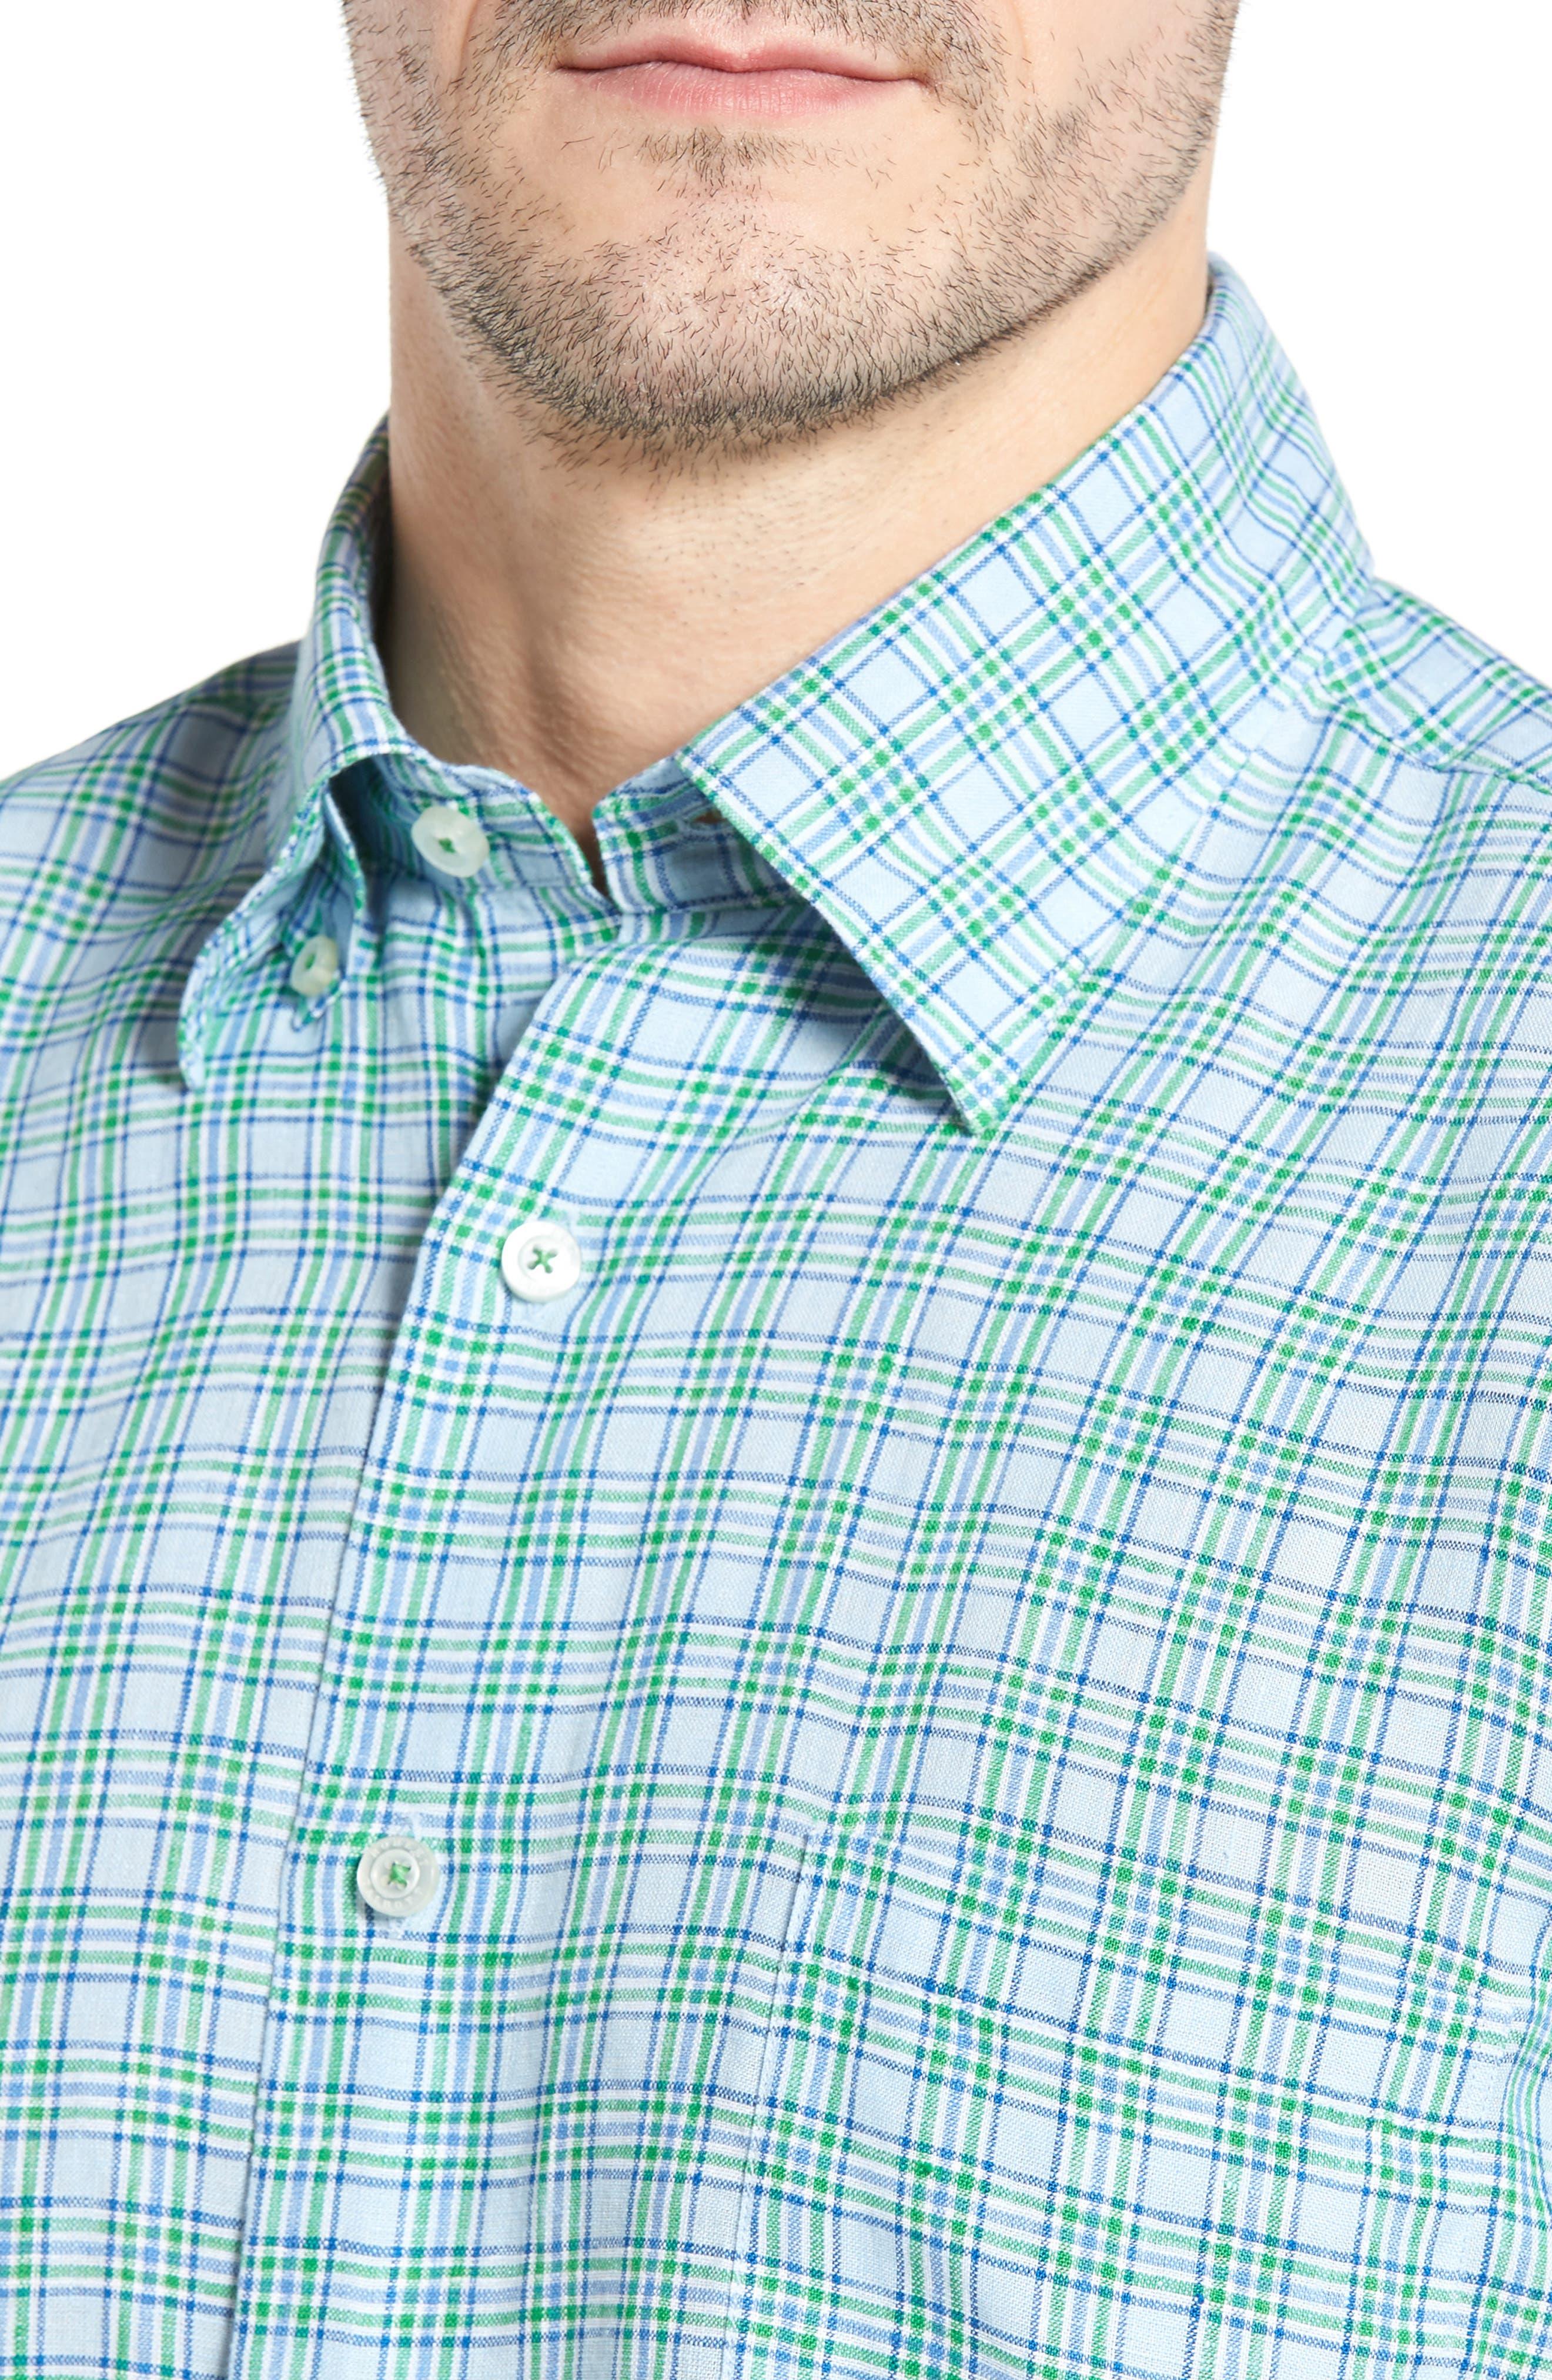 Anderson Classic Fit Sport Shirt,                             Alternate thumbnail 4, color,                             449